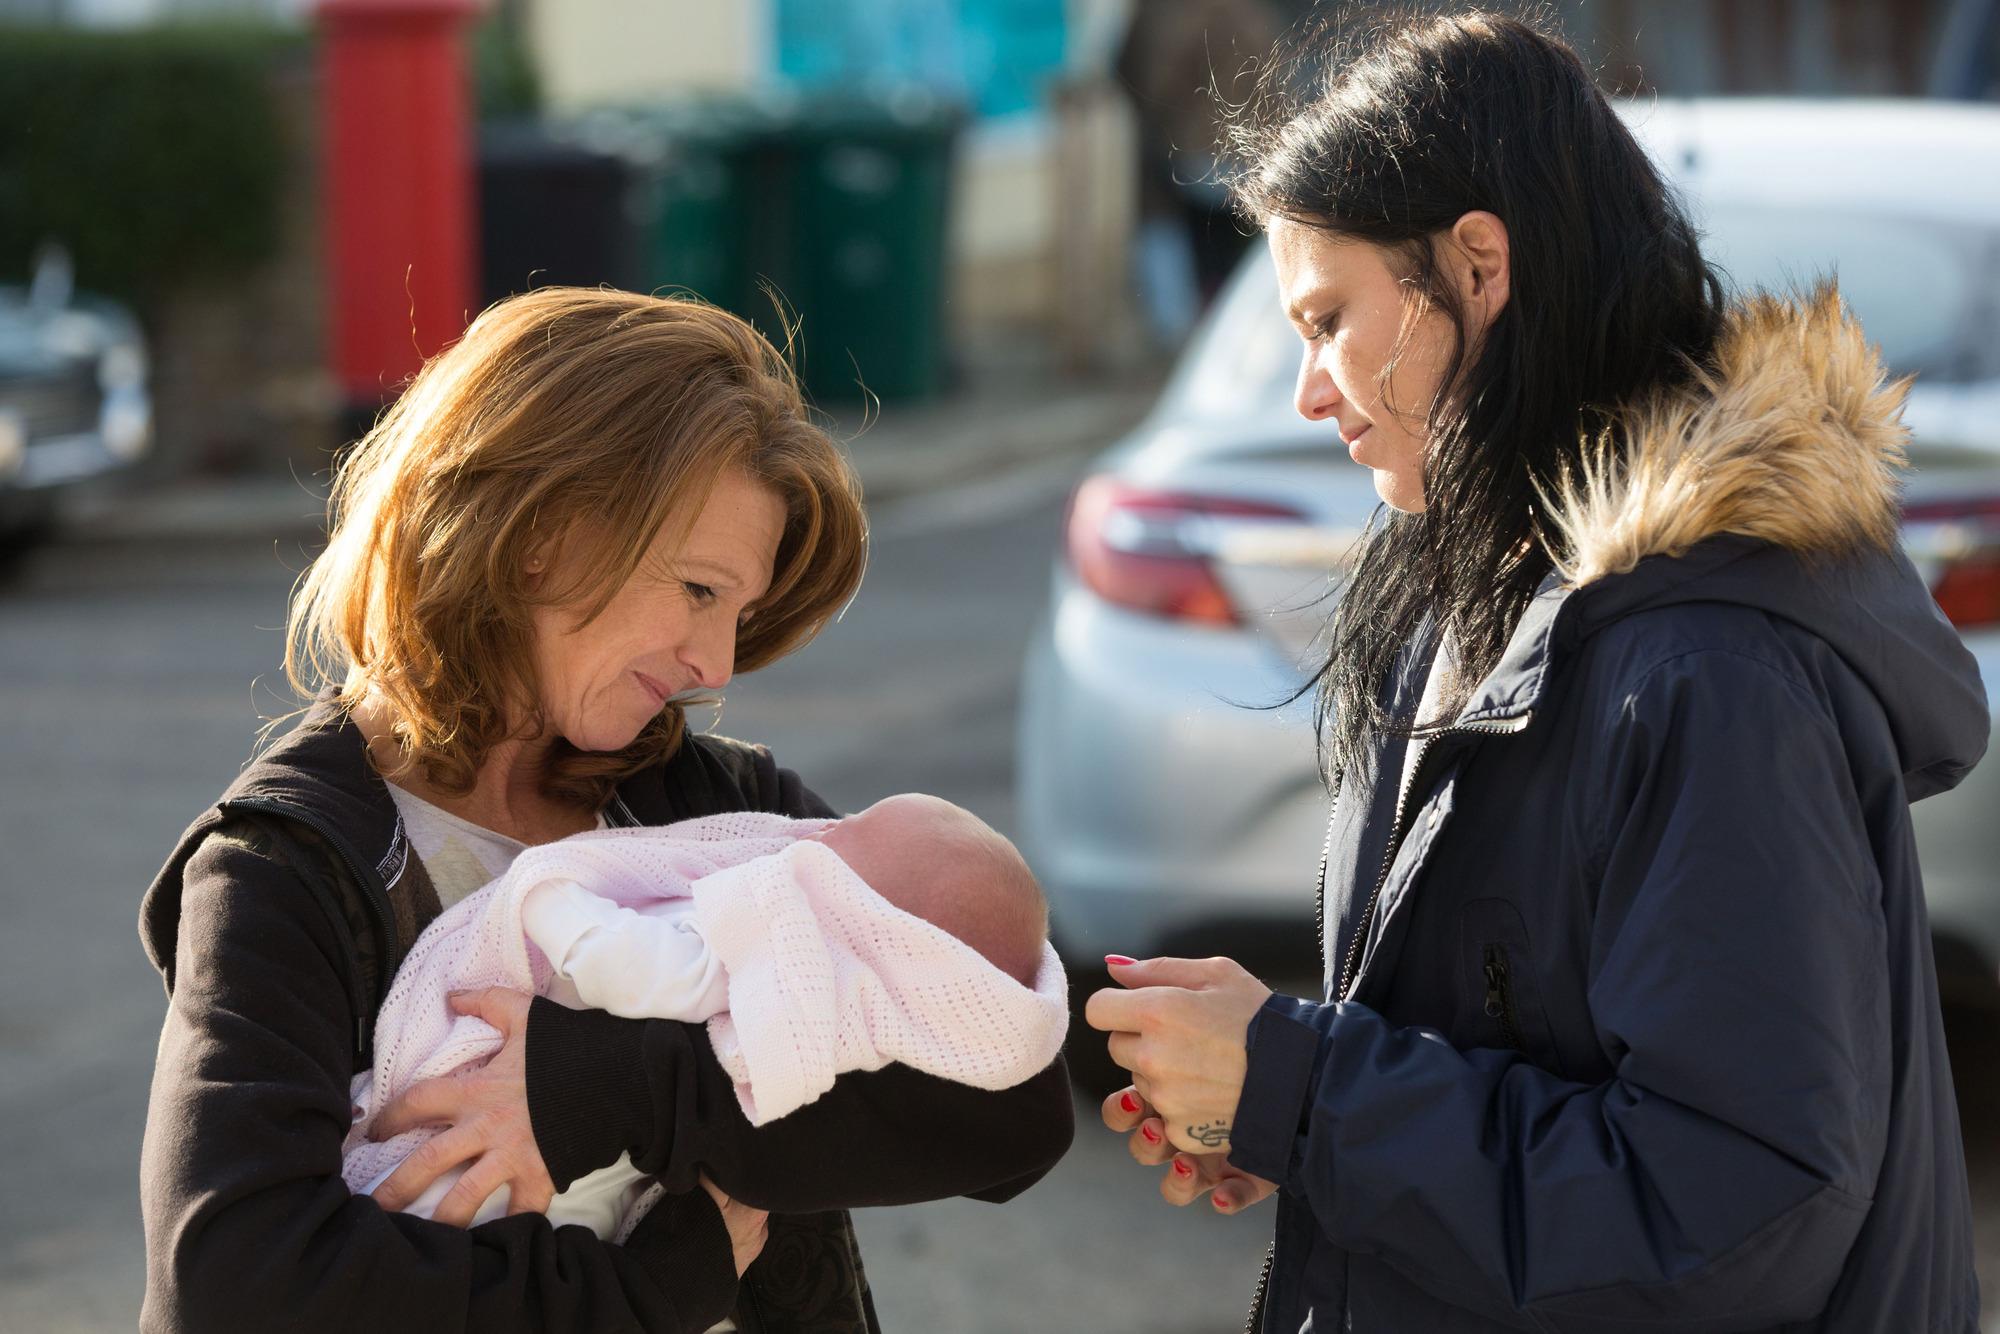 EastEnders spoilers: Hayley Slater abandons baby – will she lose her forever?